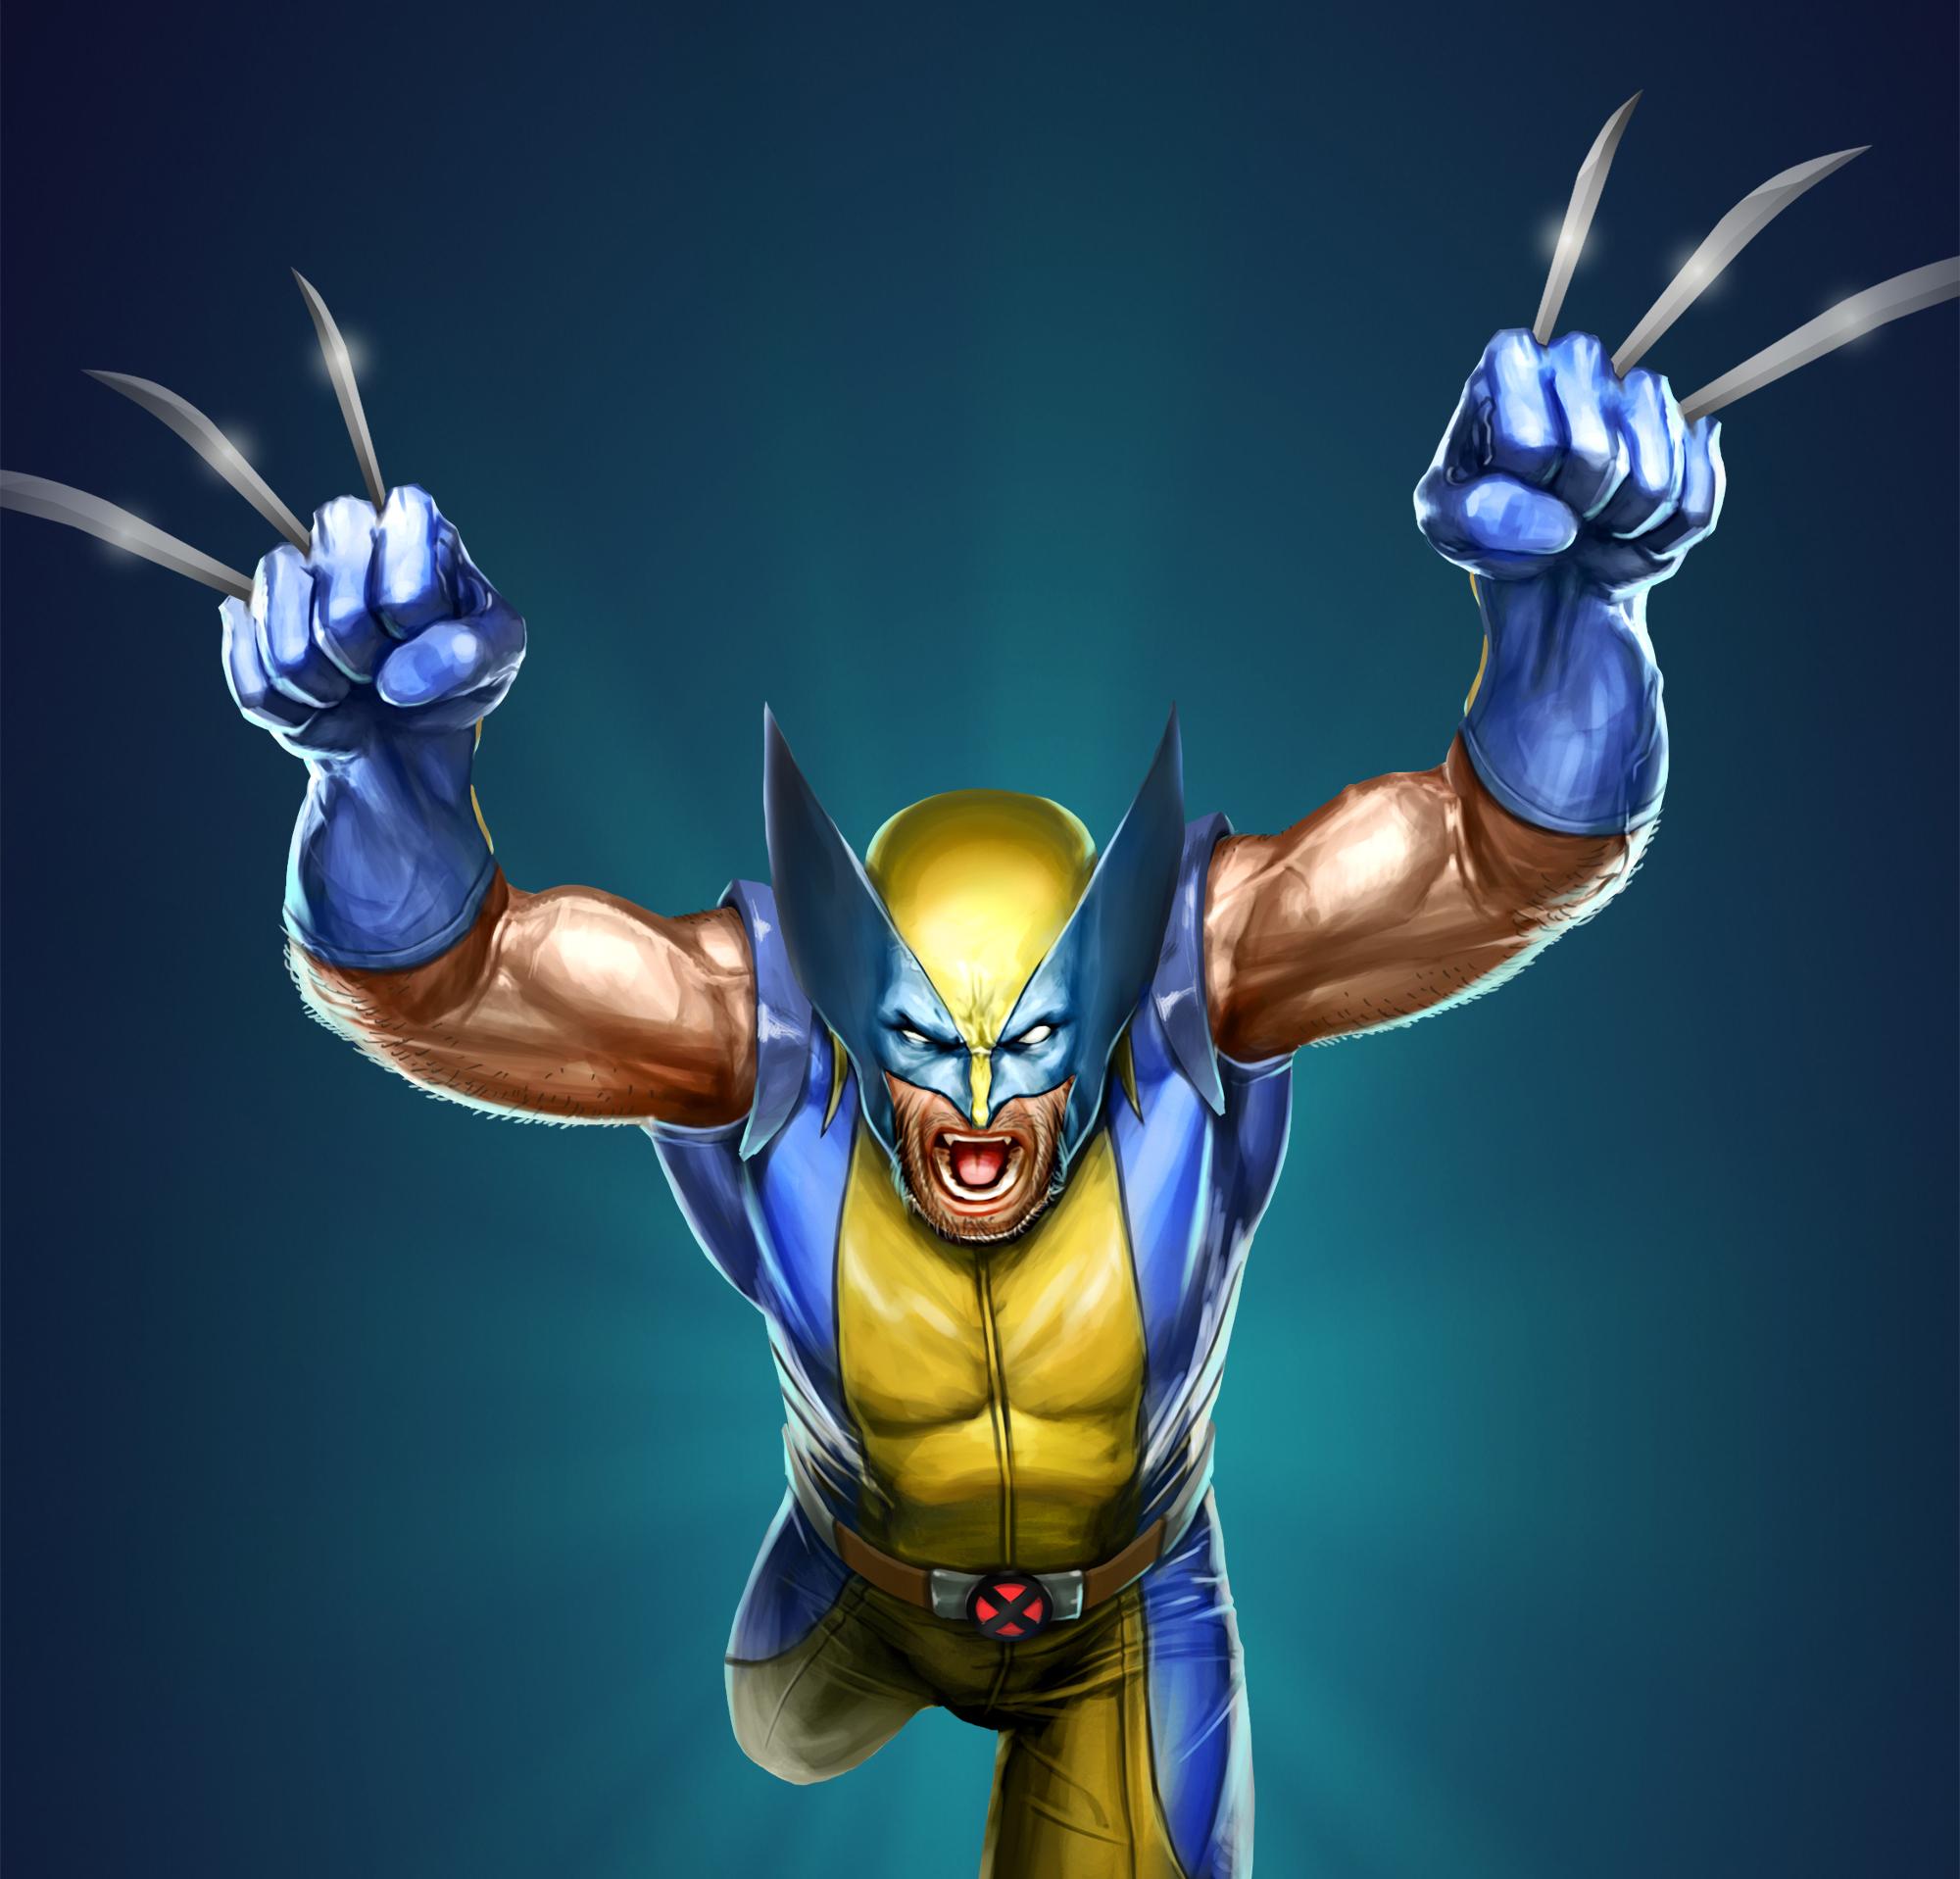 The Wolverine Marvel Artwork, HD Superheroes, 4k